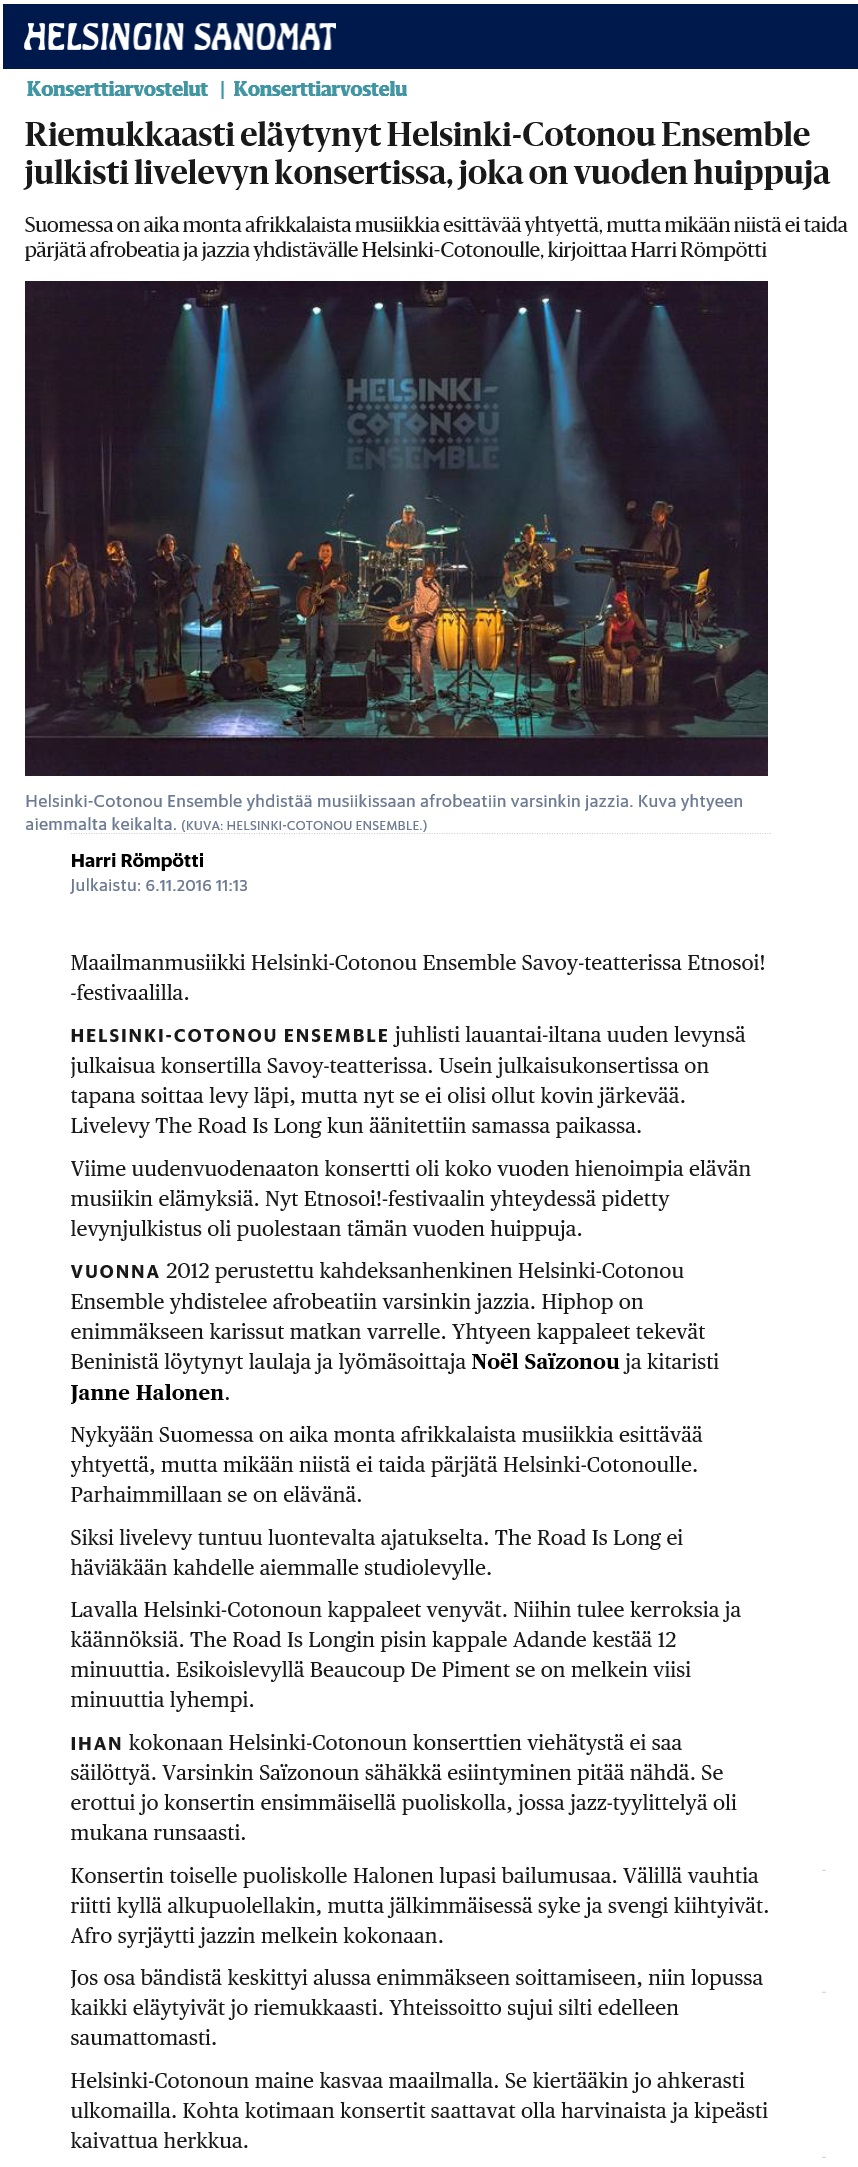 Helsingin Sanomat (Finland), 6.11.2016